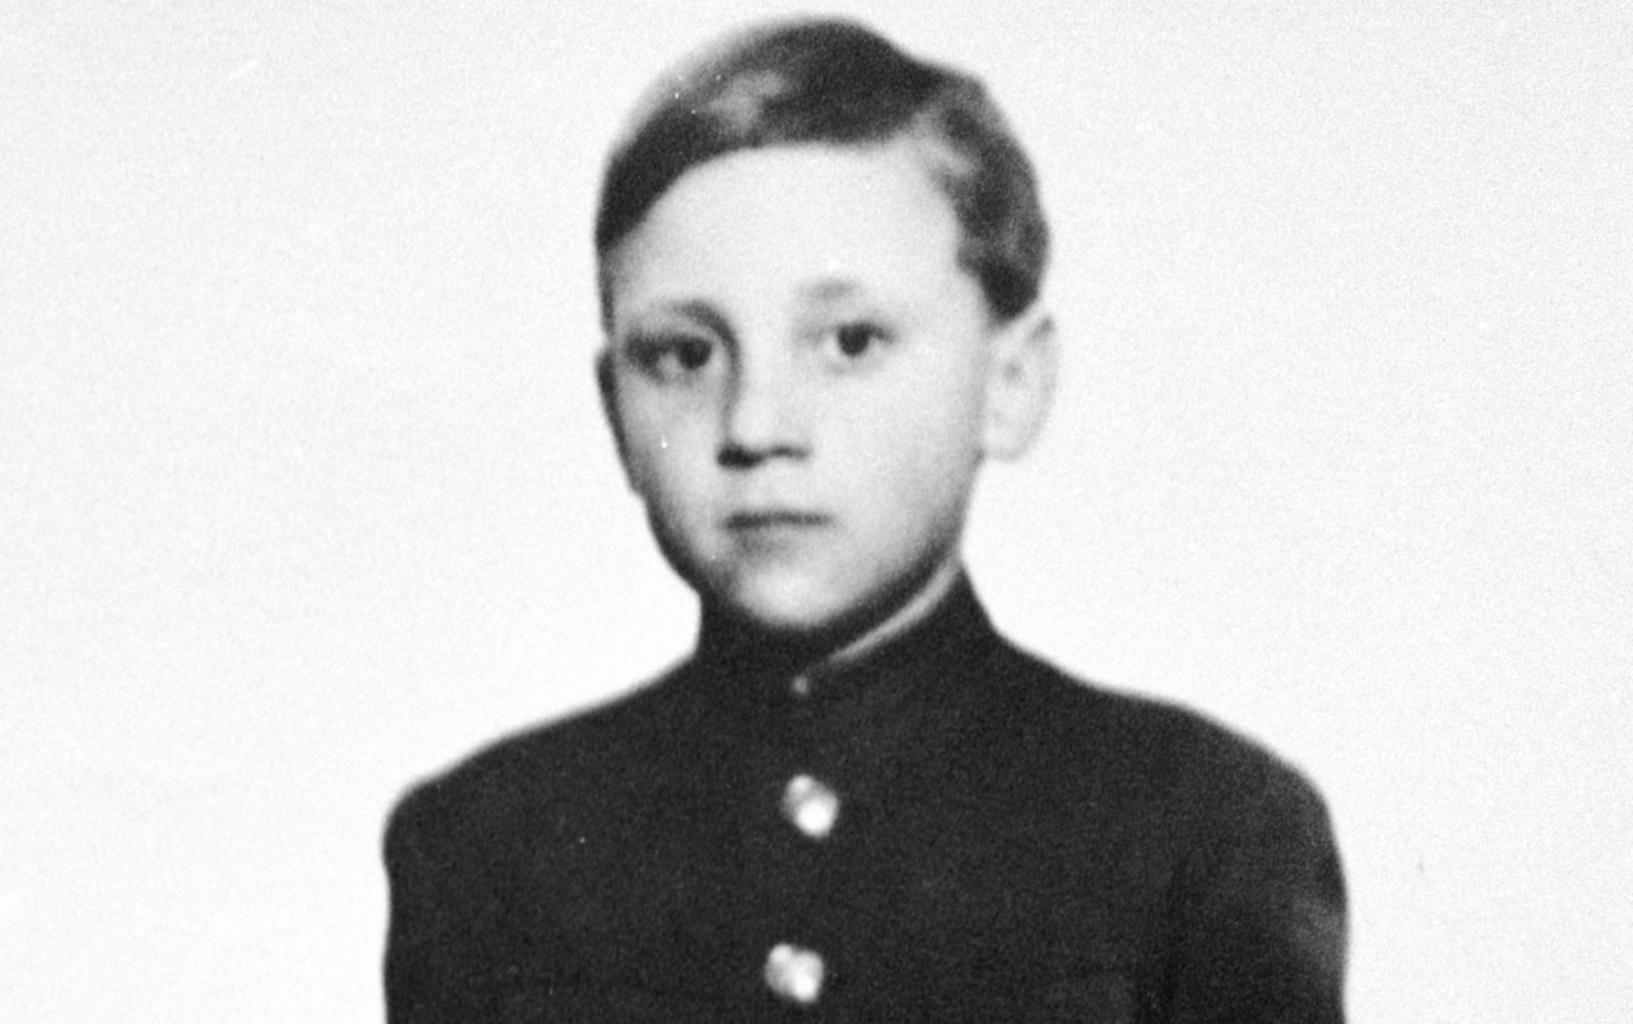 Viszockij 1946-ban #moszkvater